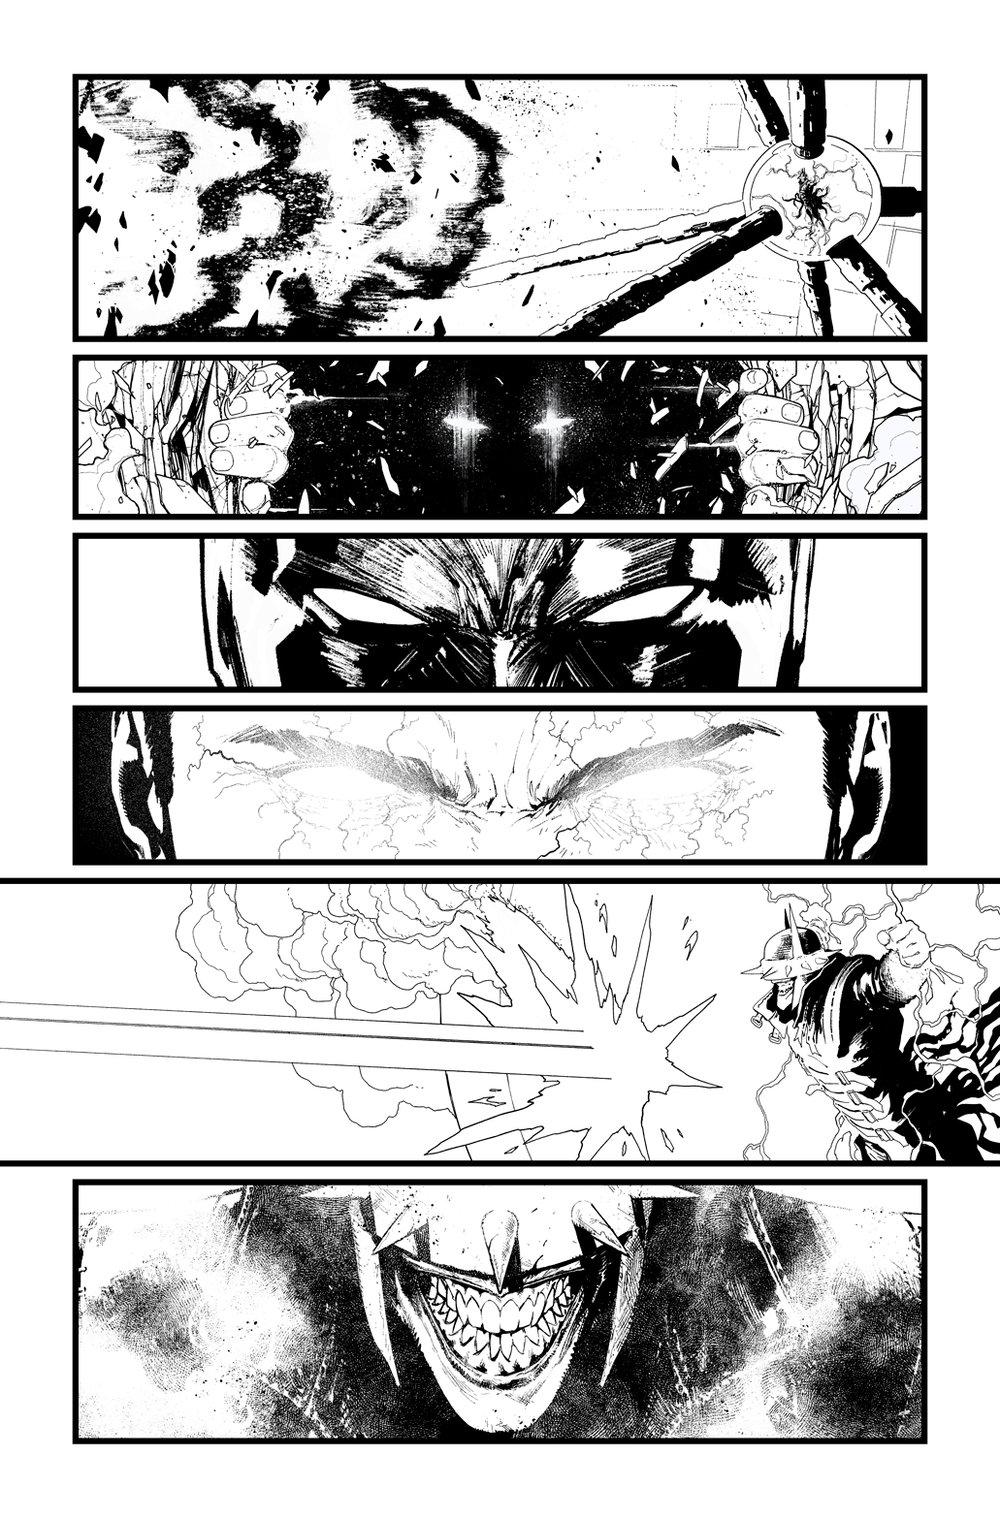 Image of BATMAN/SUPERMAN #2 p.21 ARTIST'S PROOF